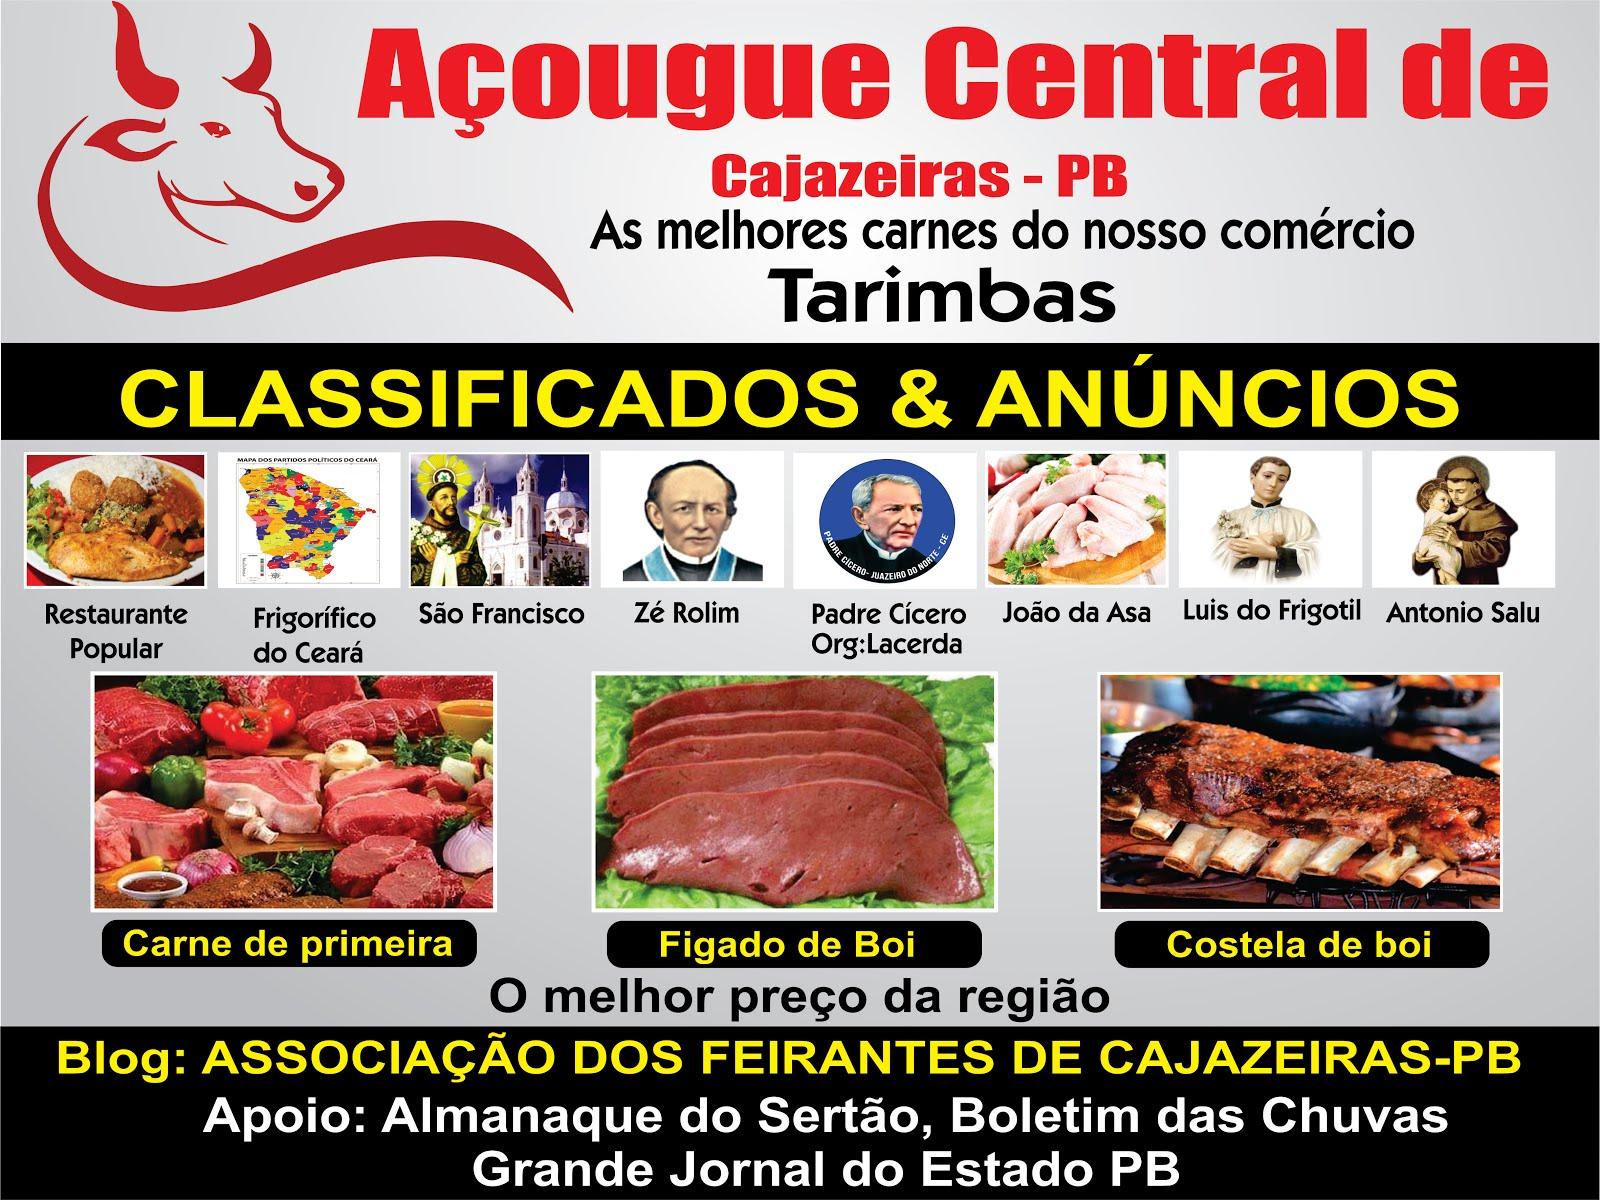 VISITE  O  MERCADO  AÇOUGUE DO CENTRO  CAJAZEIRAS PB